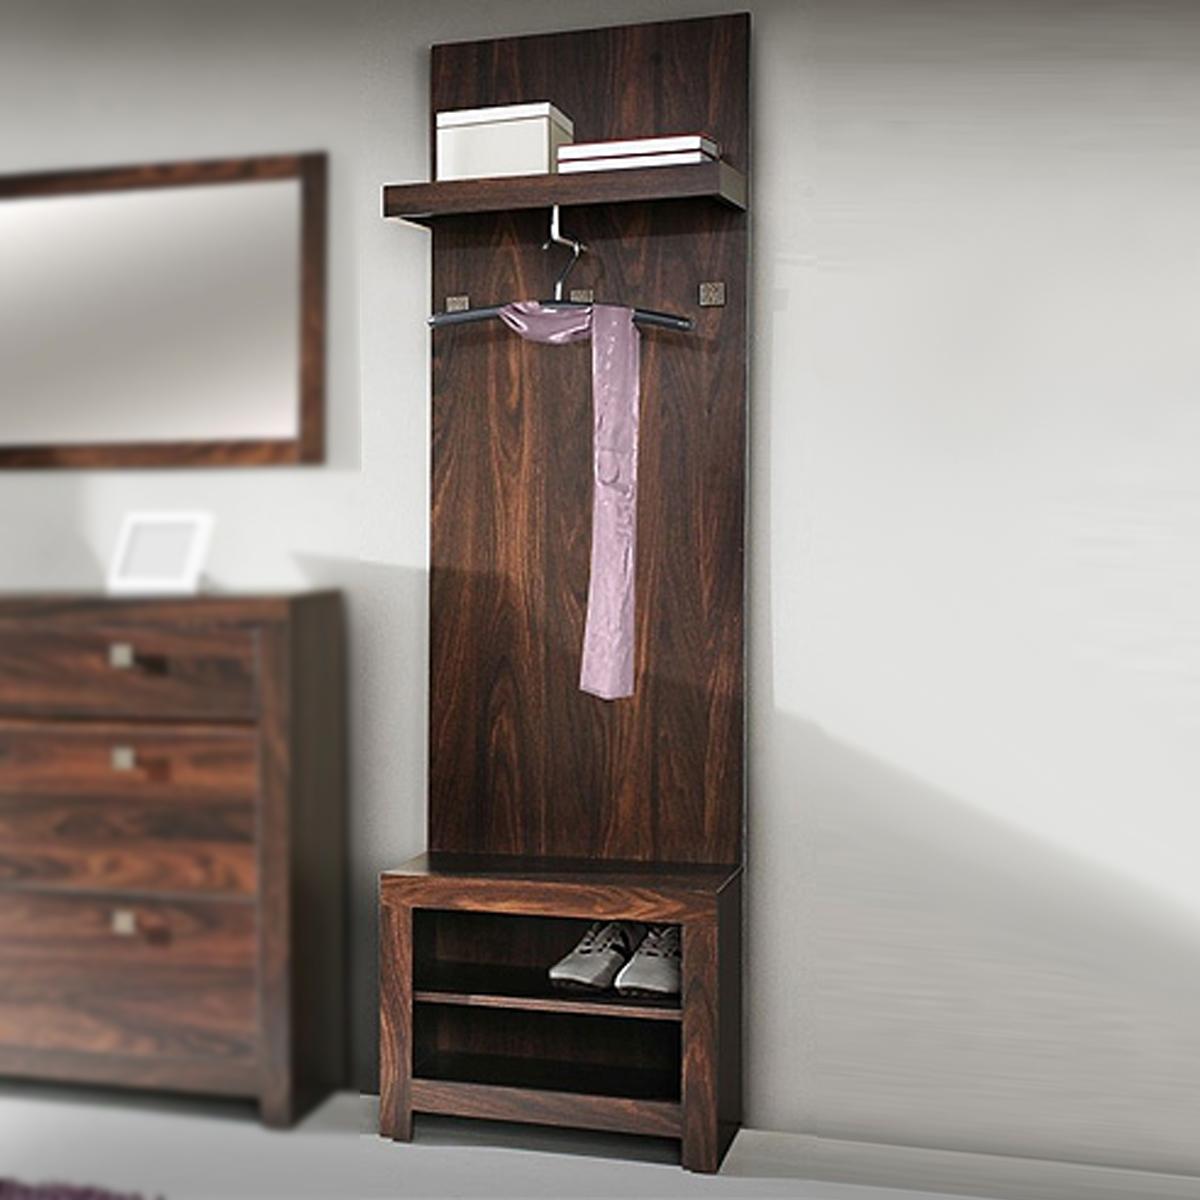 garderobe kolonialstil massivholz garderobe hutablage kleiderhaken kiefer massiv. Black Bedroom Furniture Sets. Home Design Ideas